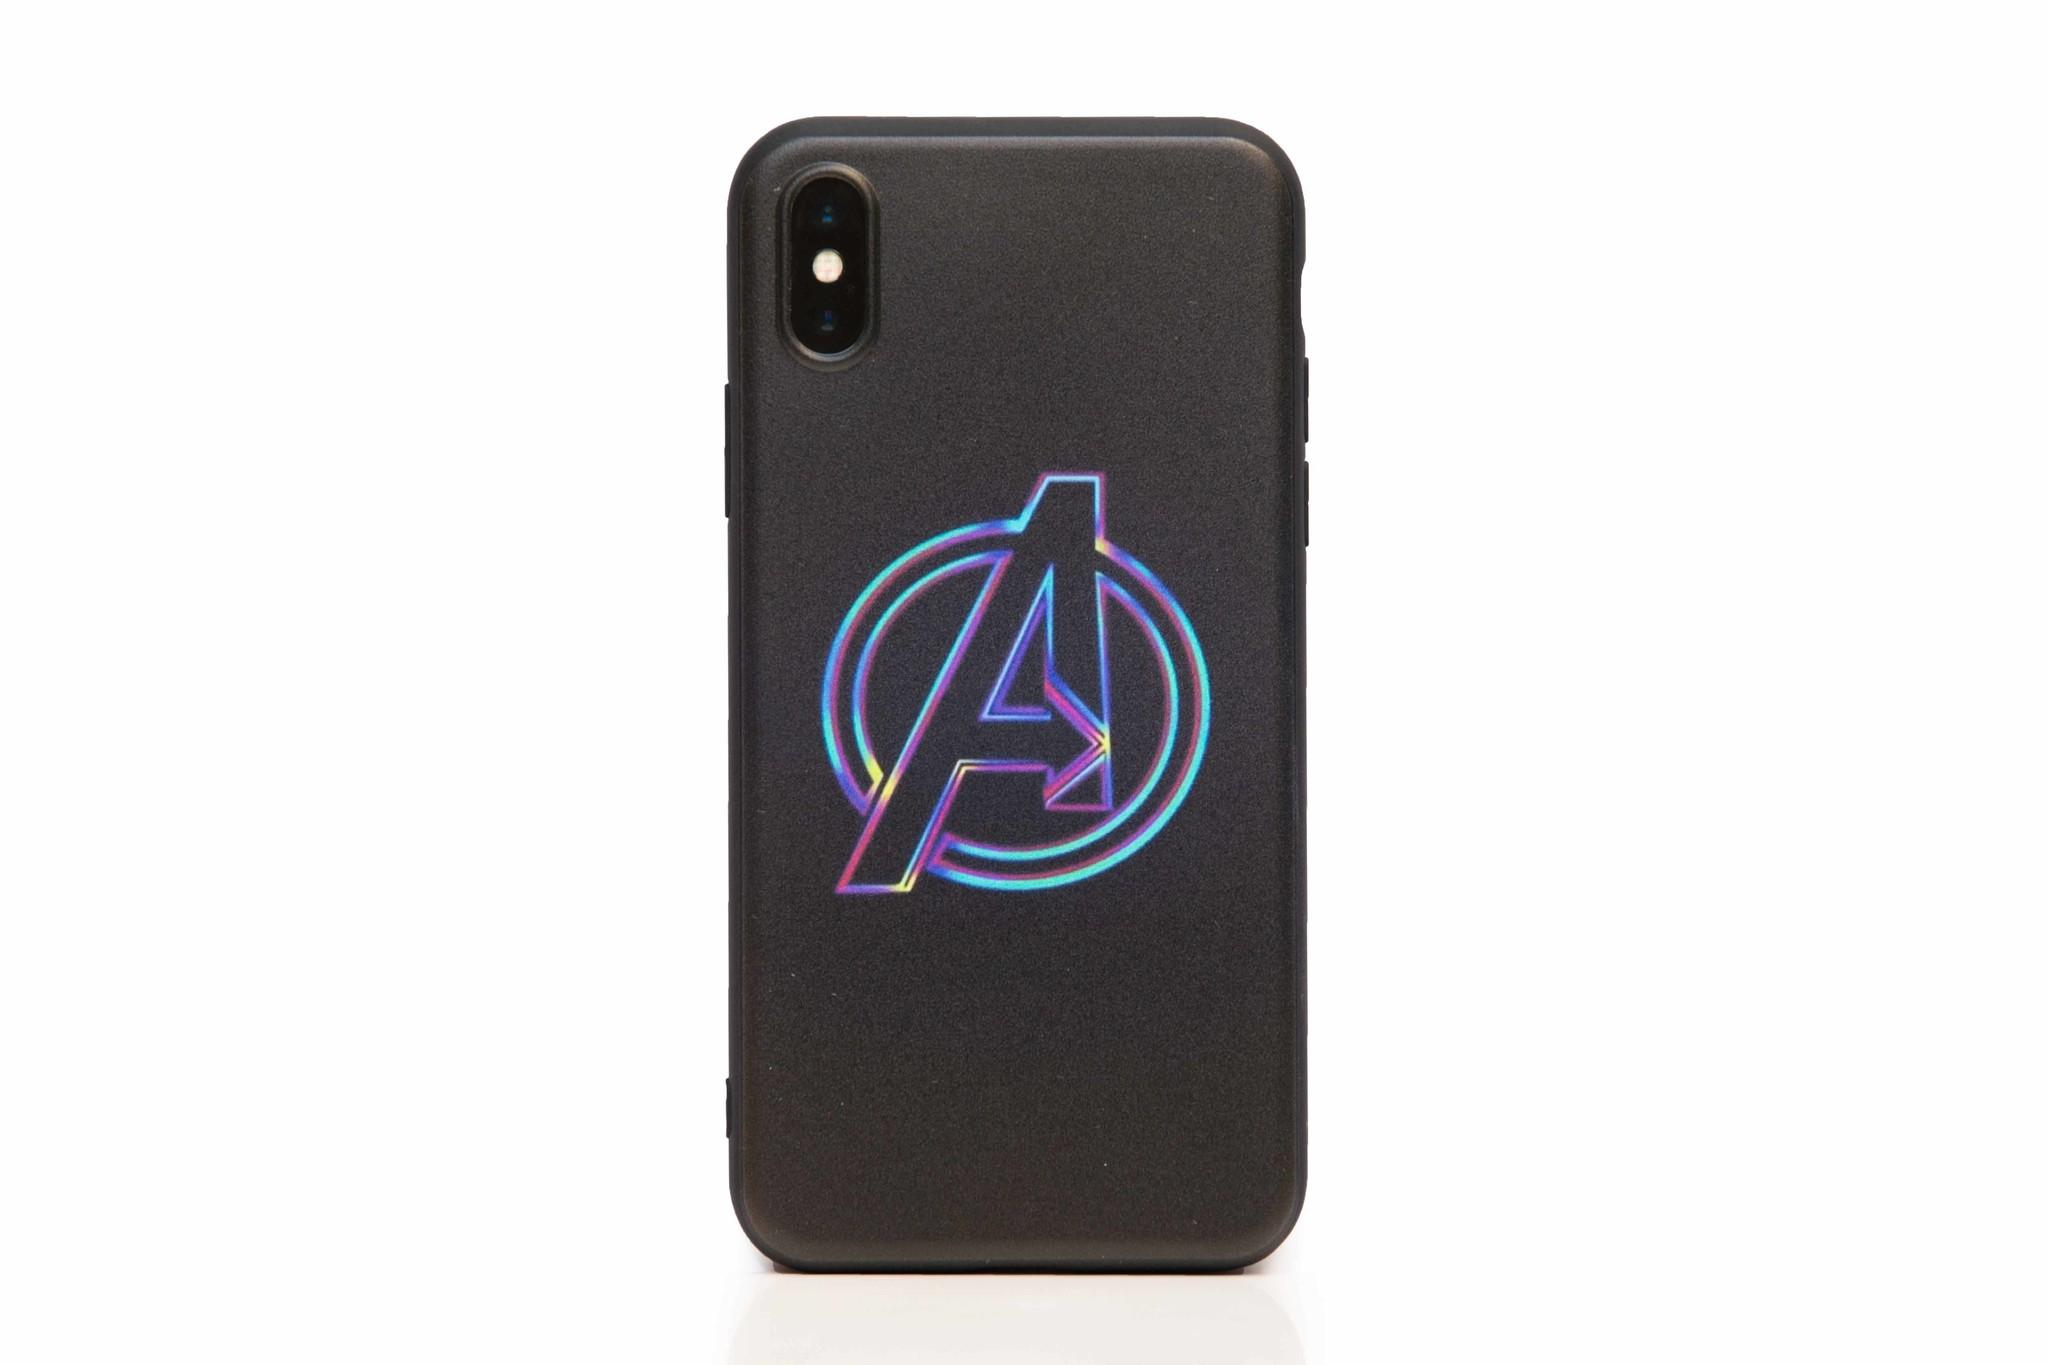 Smartphonehoesje iPhone XR | Marvel (Avengers logo)